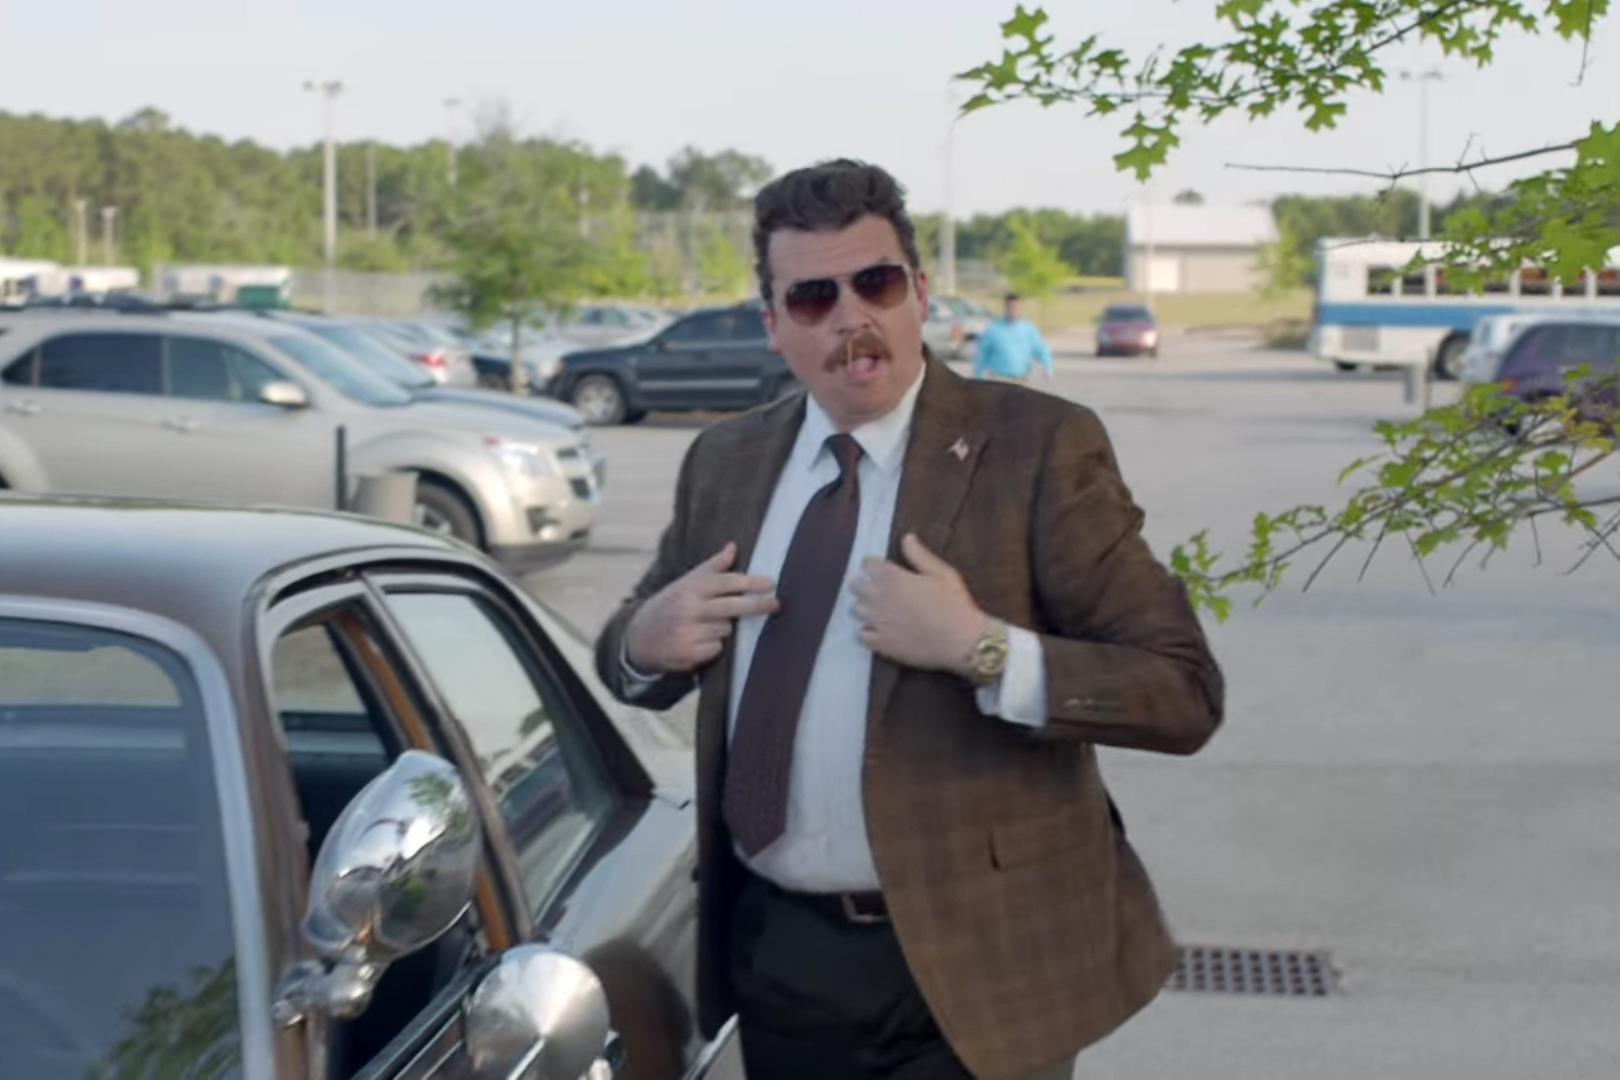 HBO Teases Upcoming Series 'Vice Principals' Starring Danny McBride & Walton Goggins